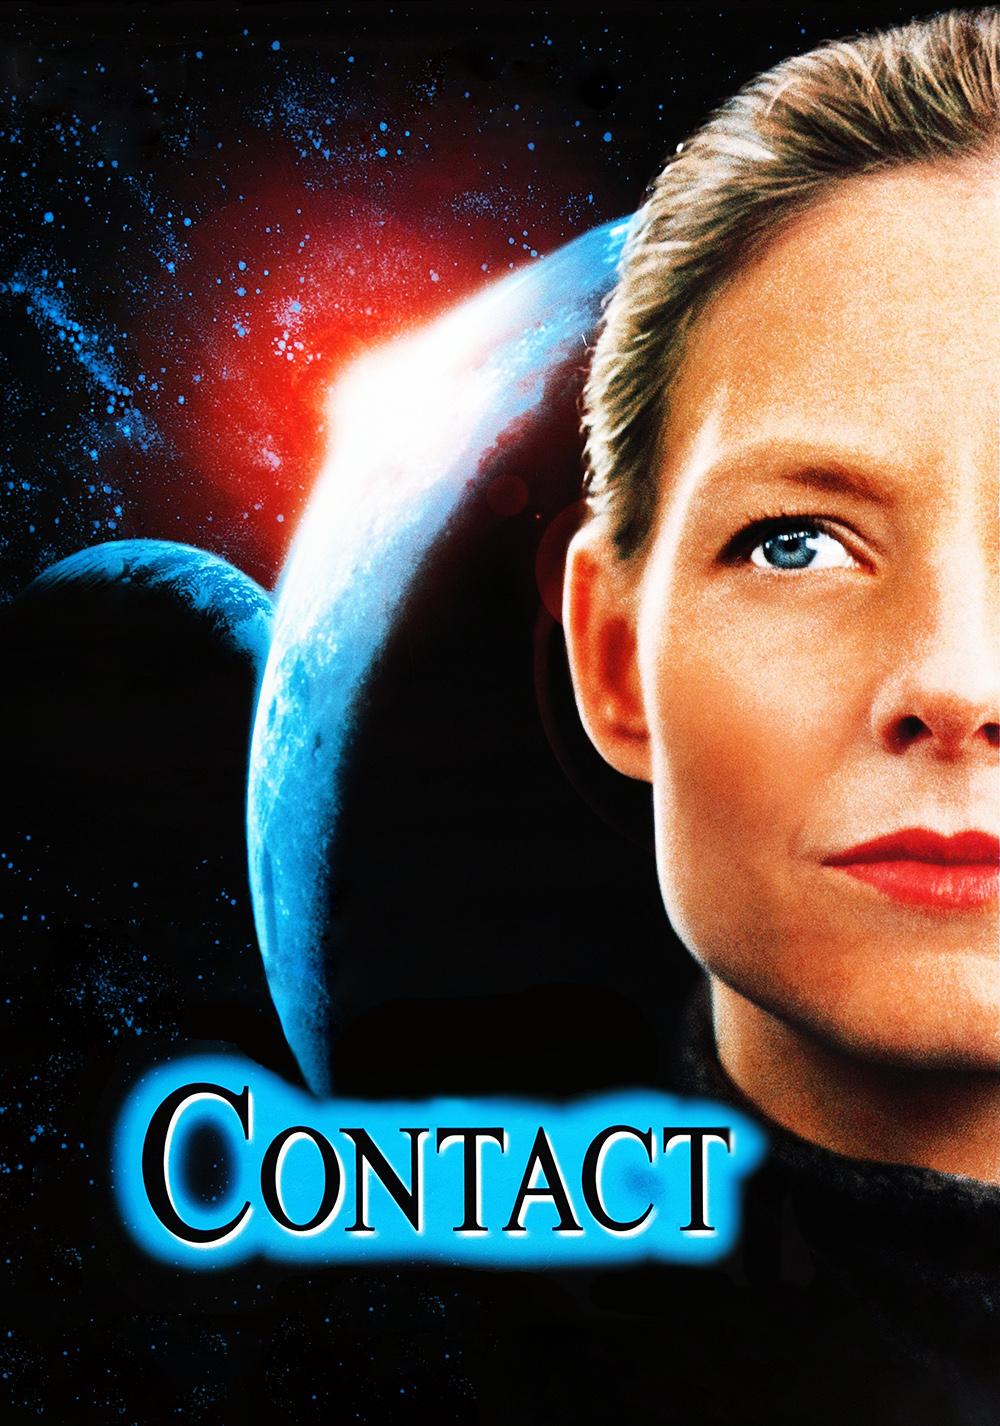 Contact Movie Fanart Fanart Tv